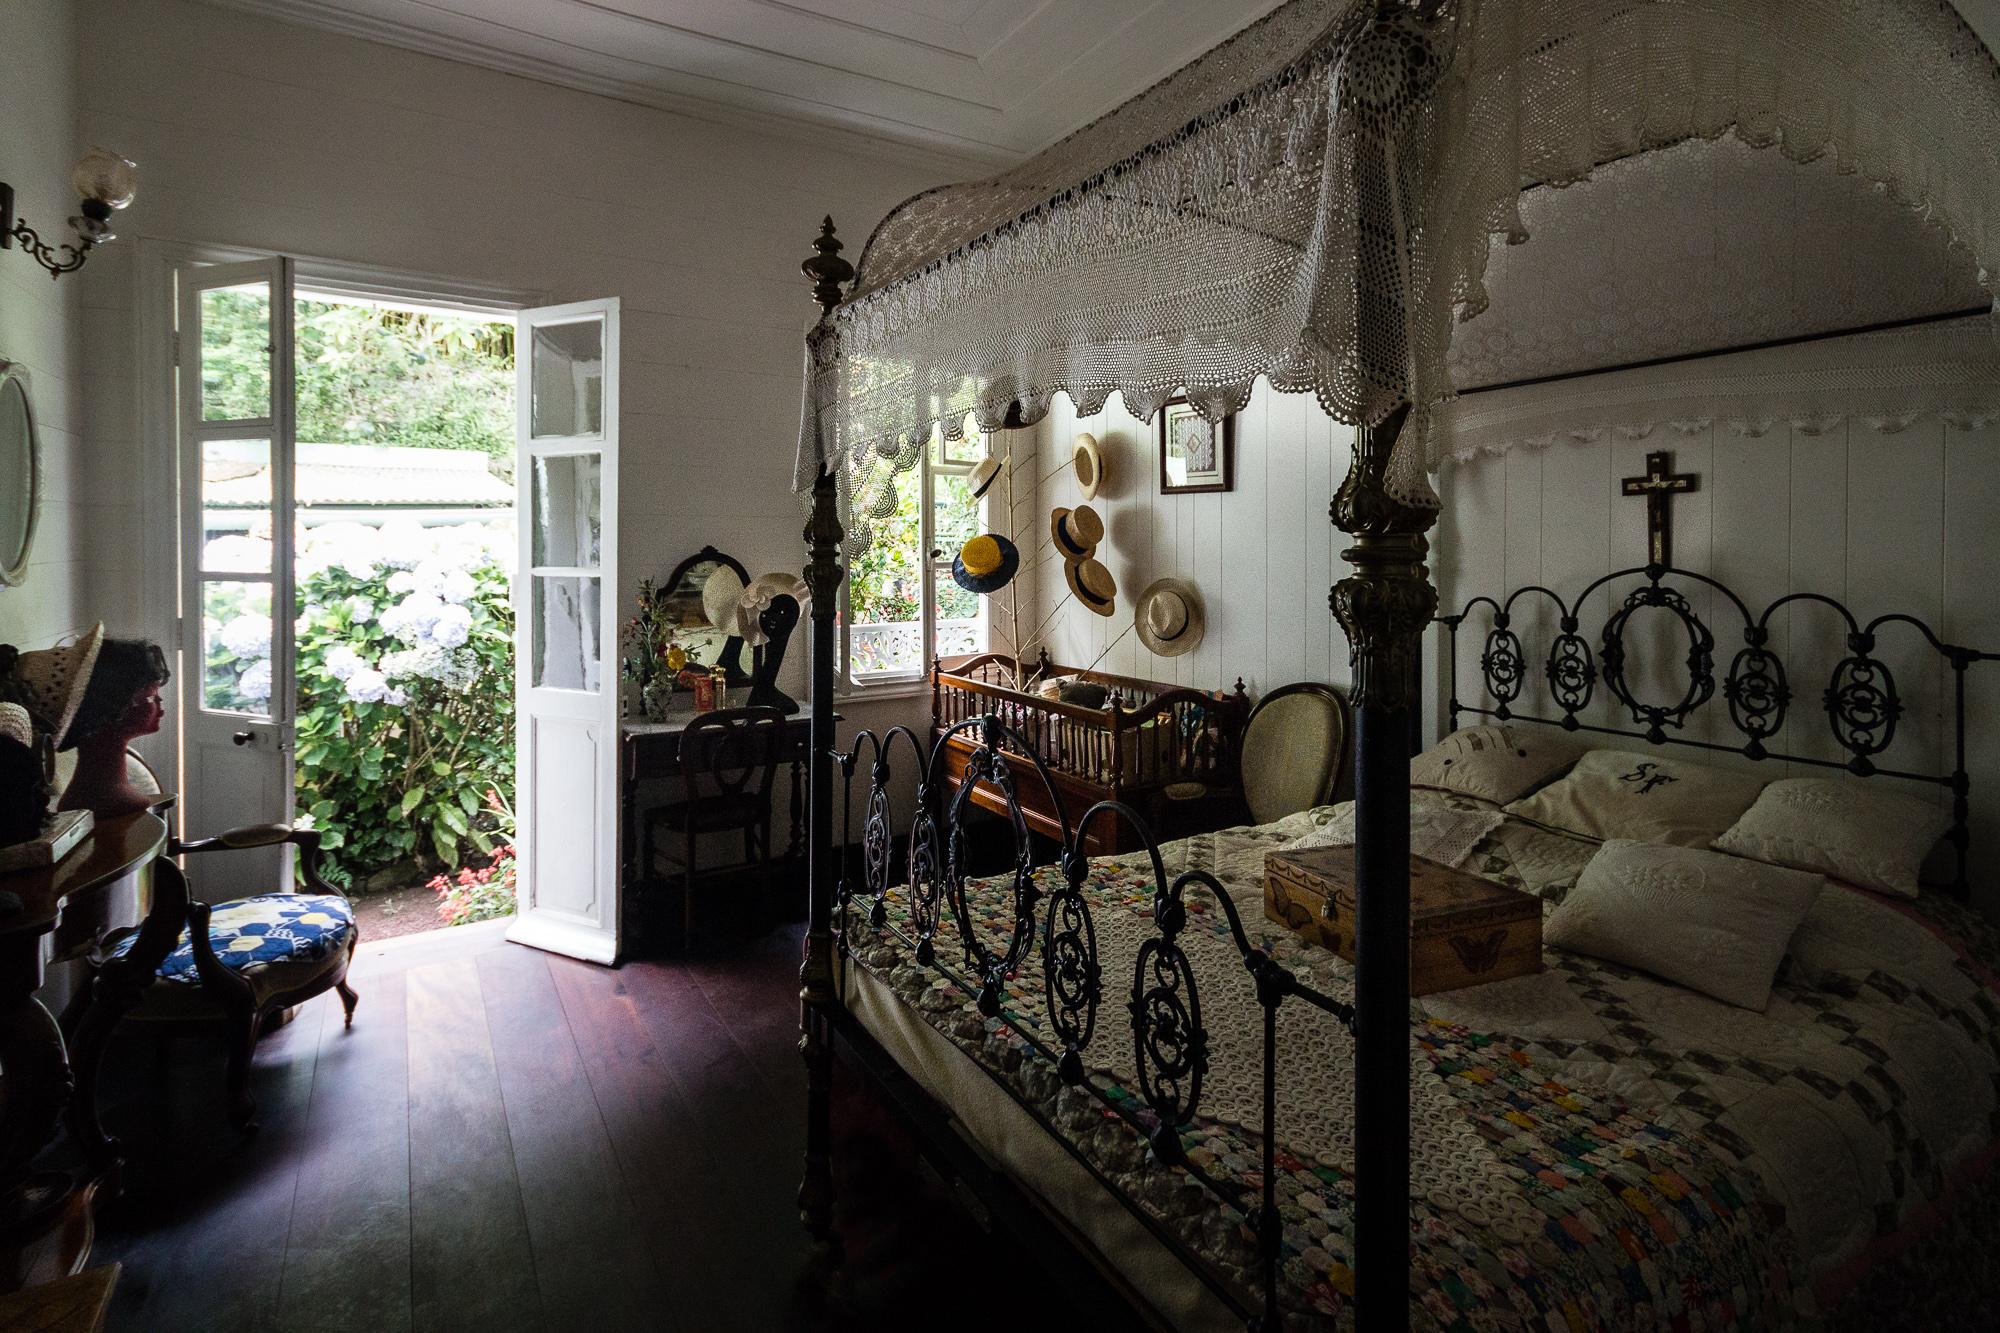 interieur maison folio hell-bourg